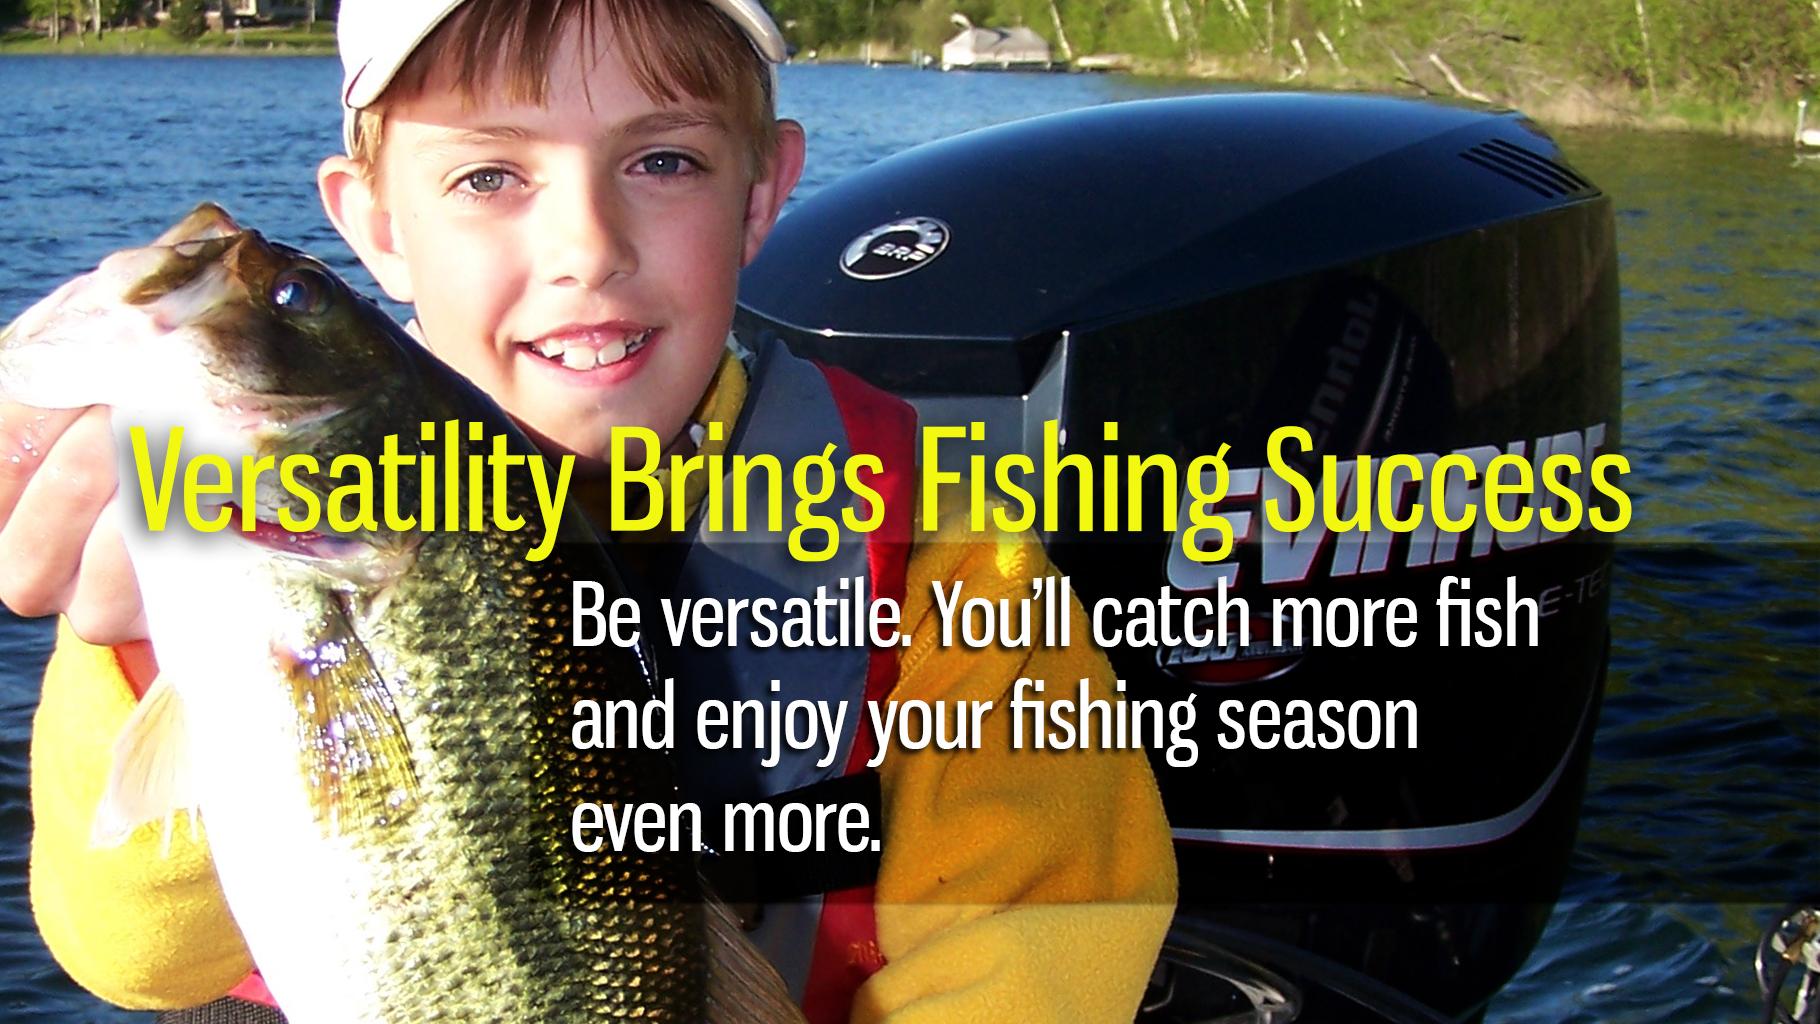 Versatility Brings Fishing Success